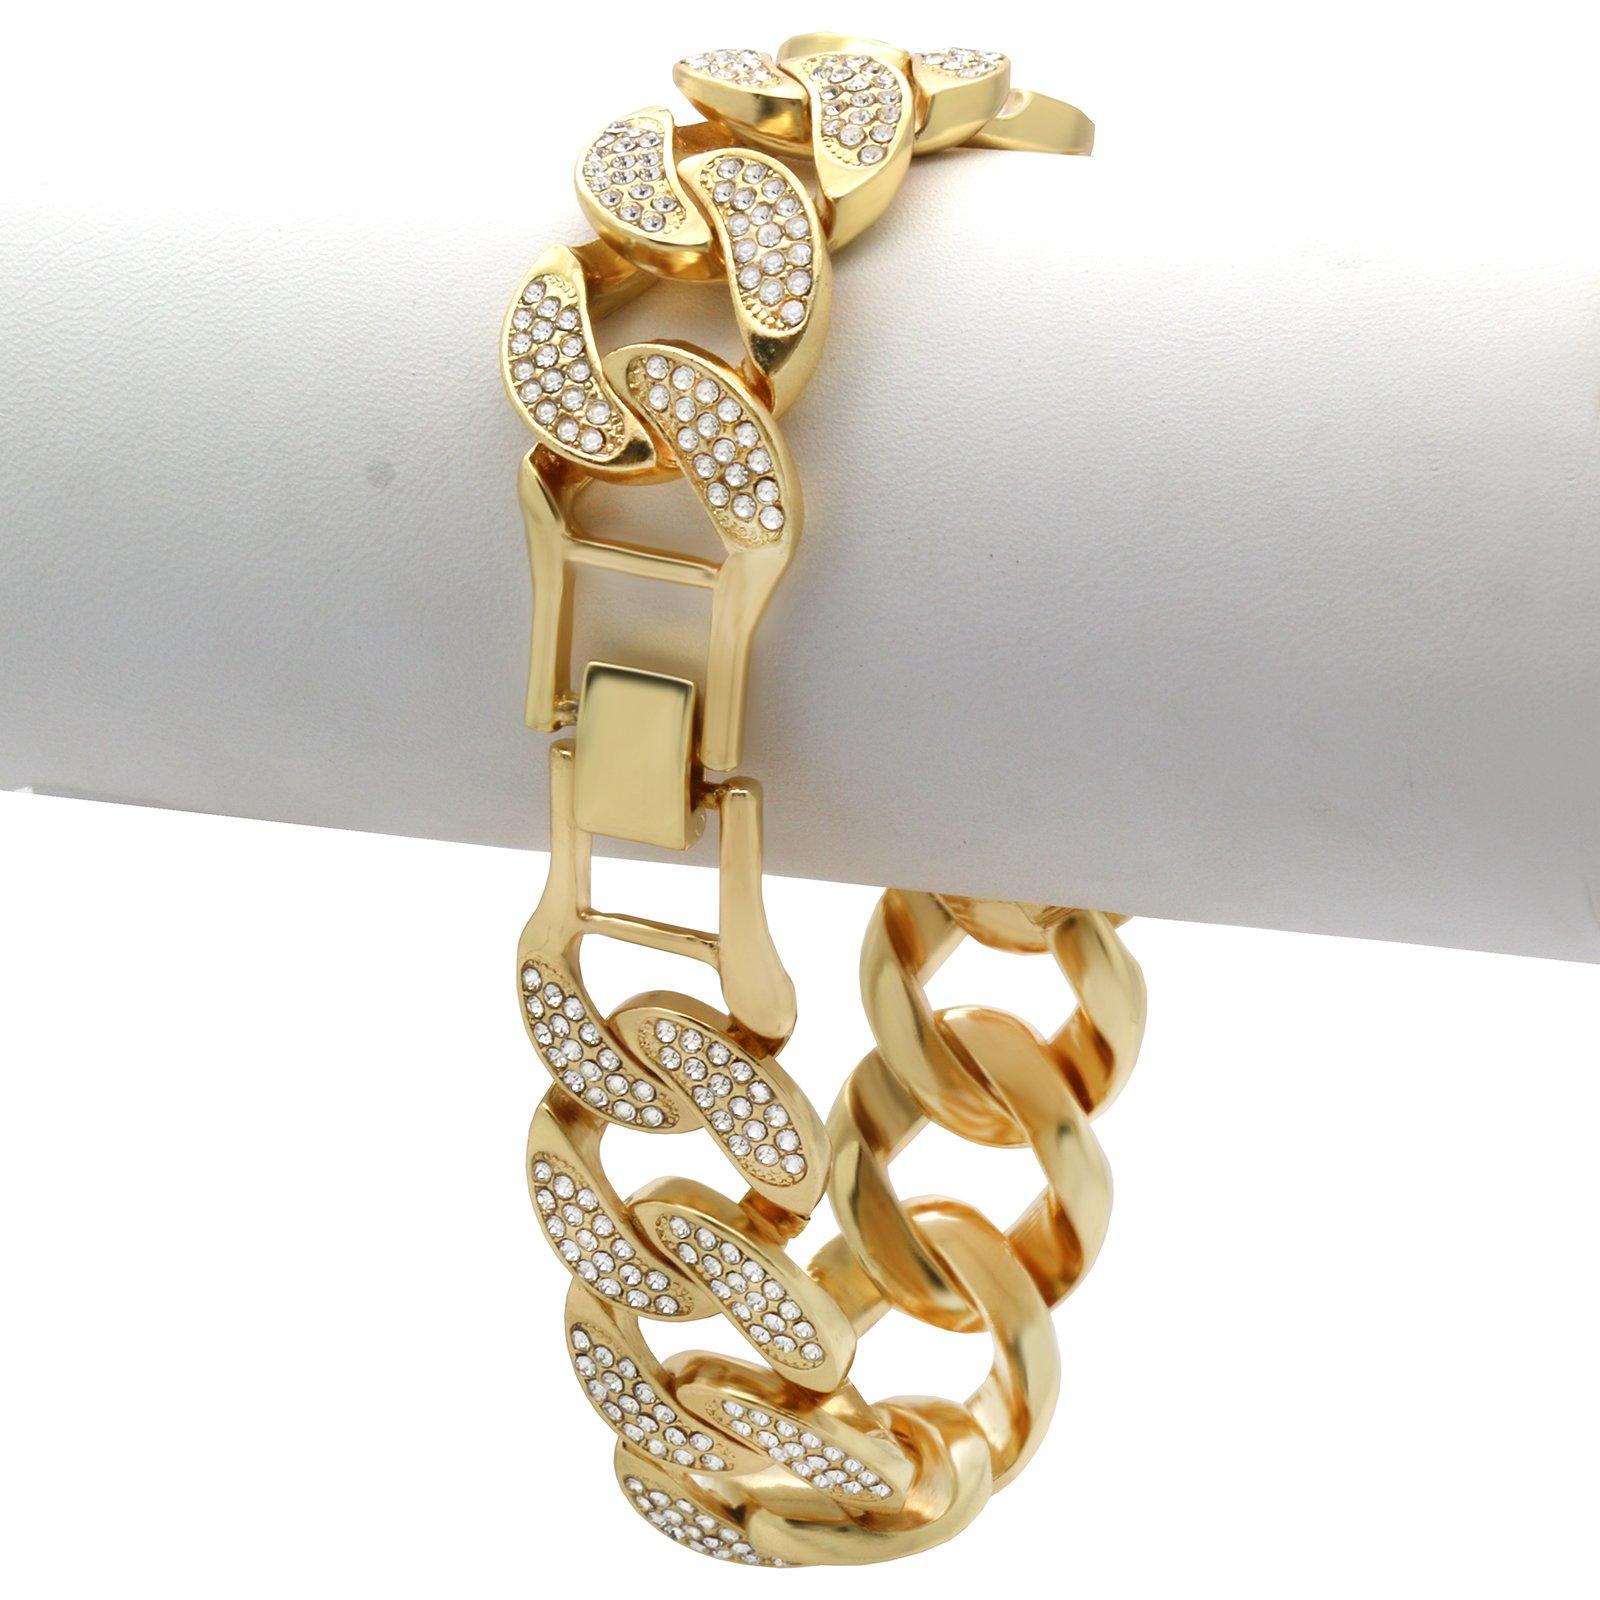 L & L Nation Gold Tone 20mm Cuban Link Lobster Lock Iced Out Clear Cz Stones Hip Hop Bracelet 9'' Inch PLUS Cz Earrings SET